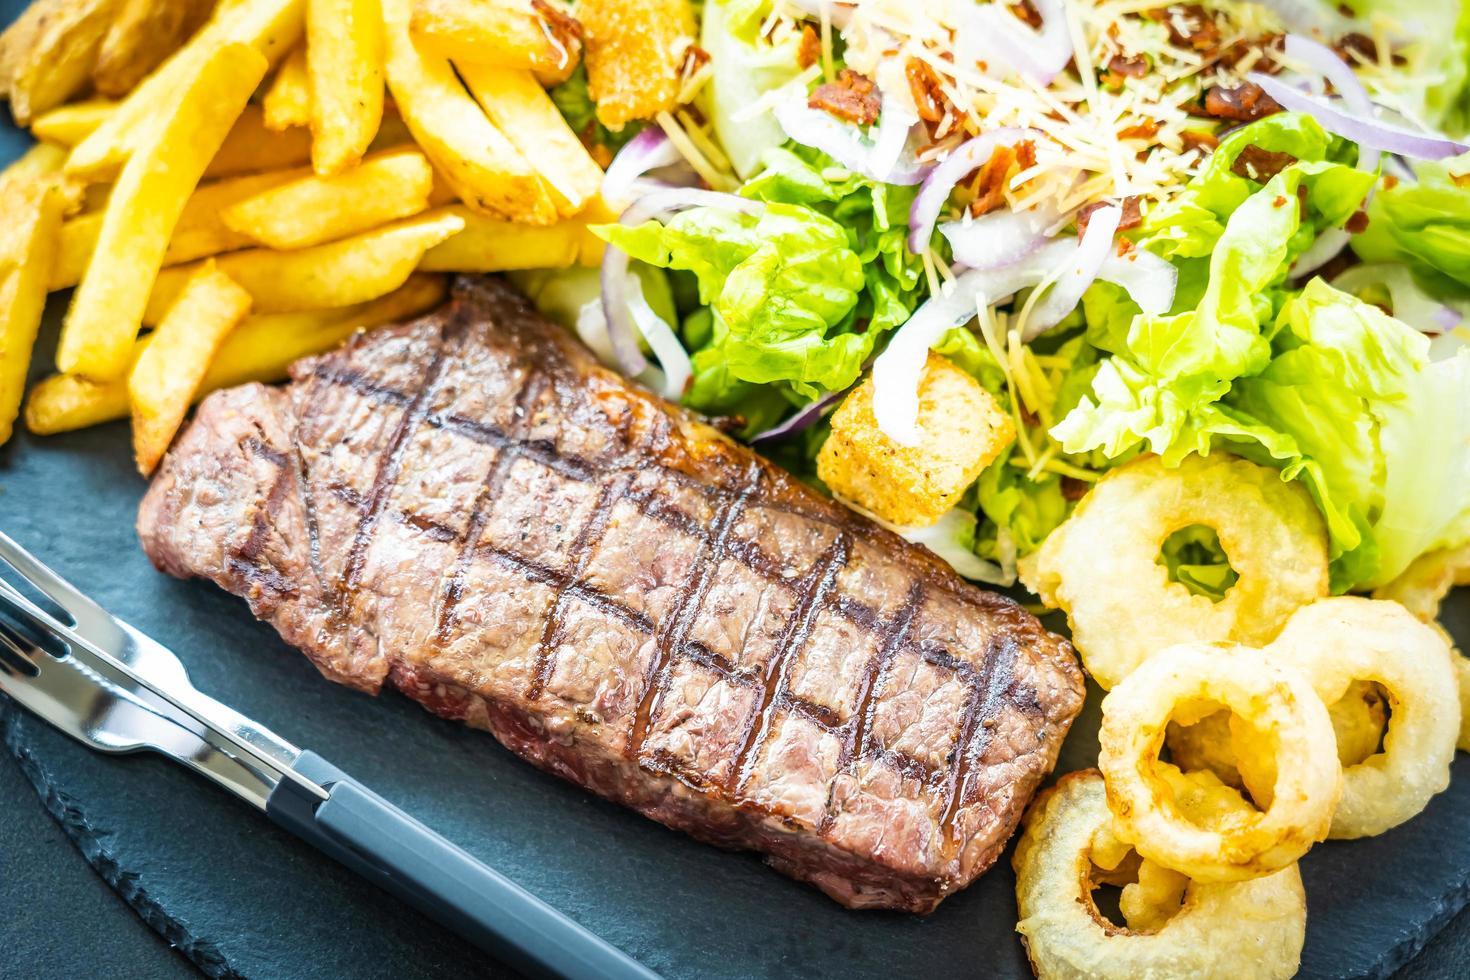 gegrilde biefstuk met frietjes uienring met saus en verse groente foto